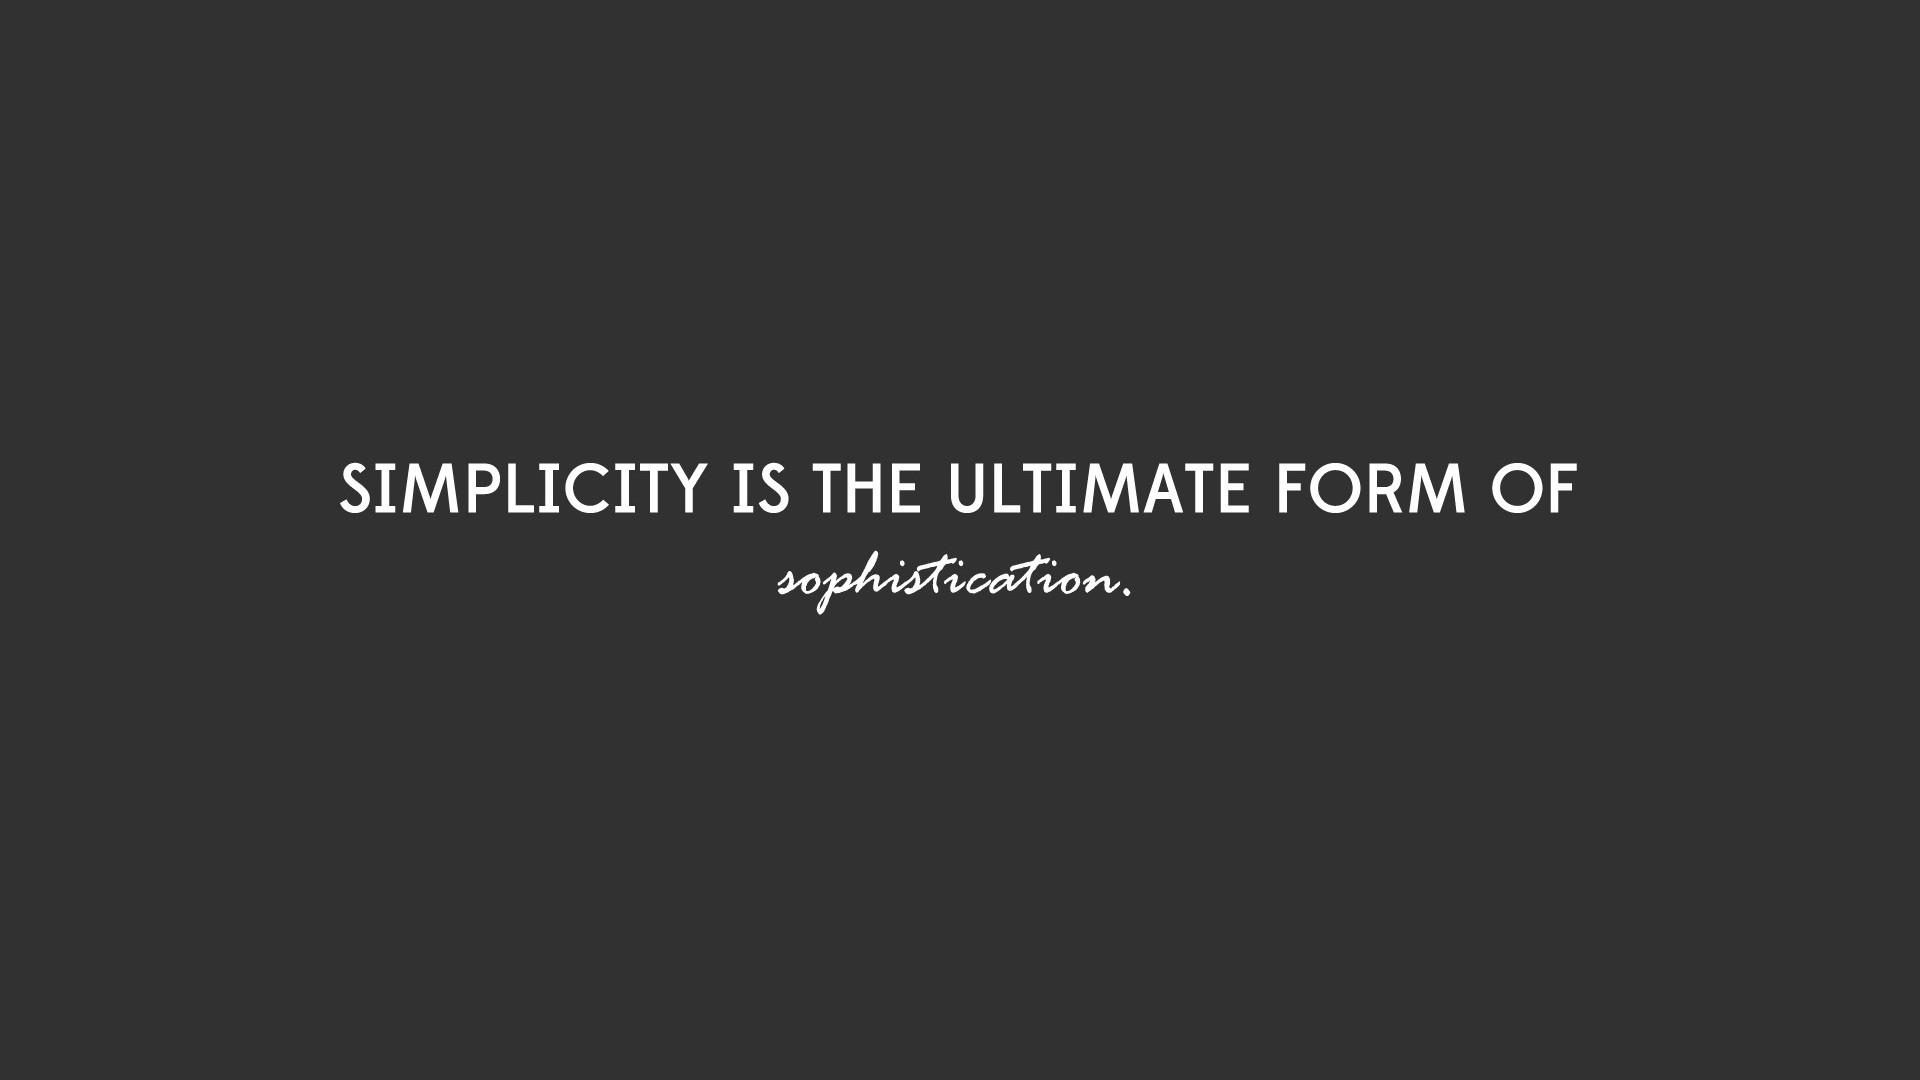 simplicity vs sophistication